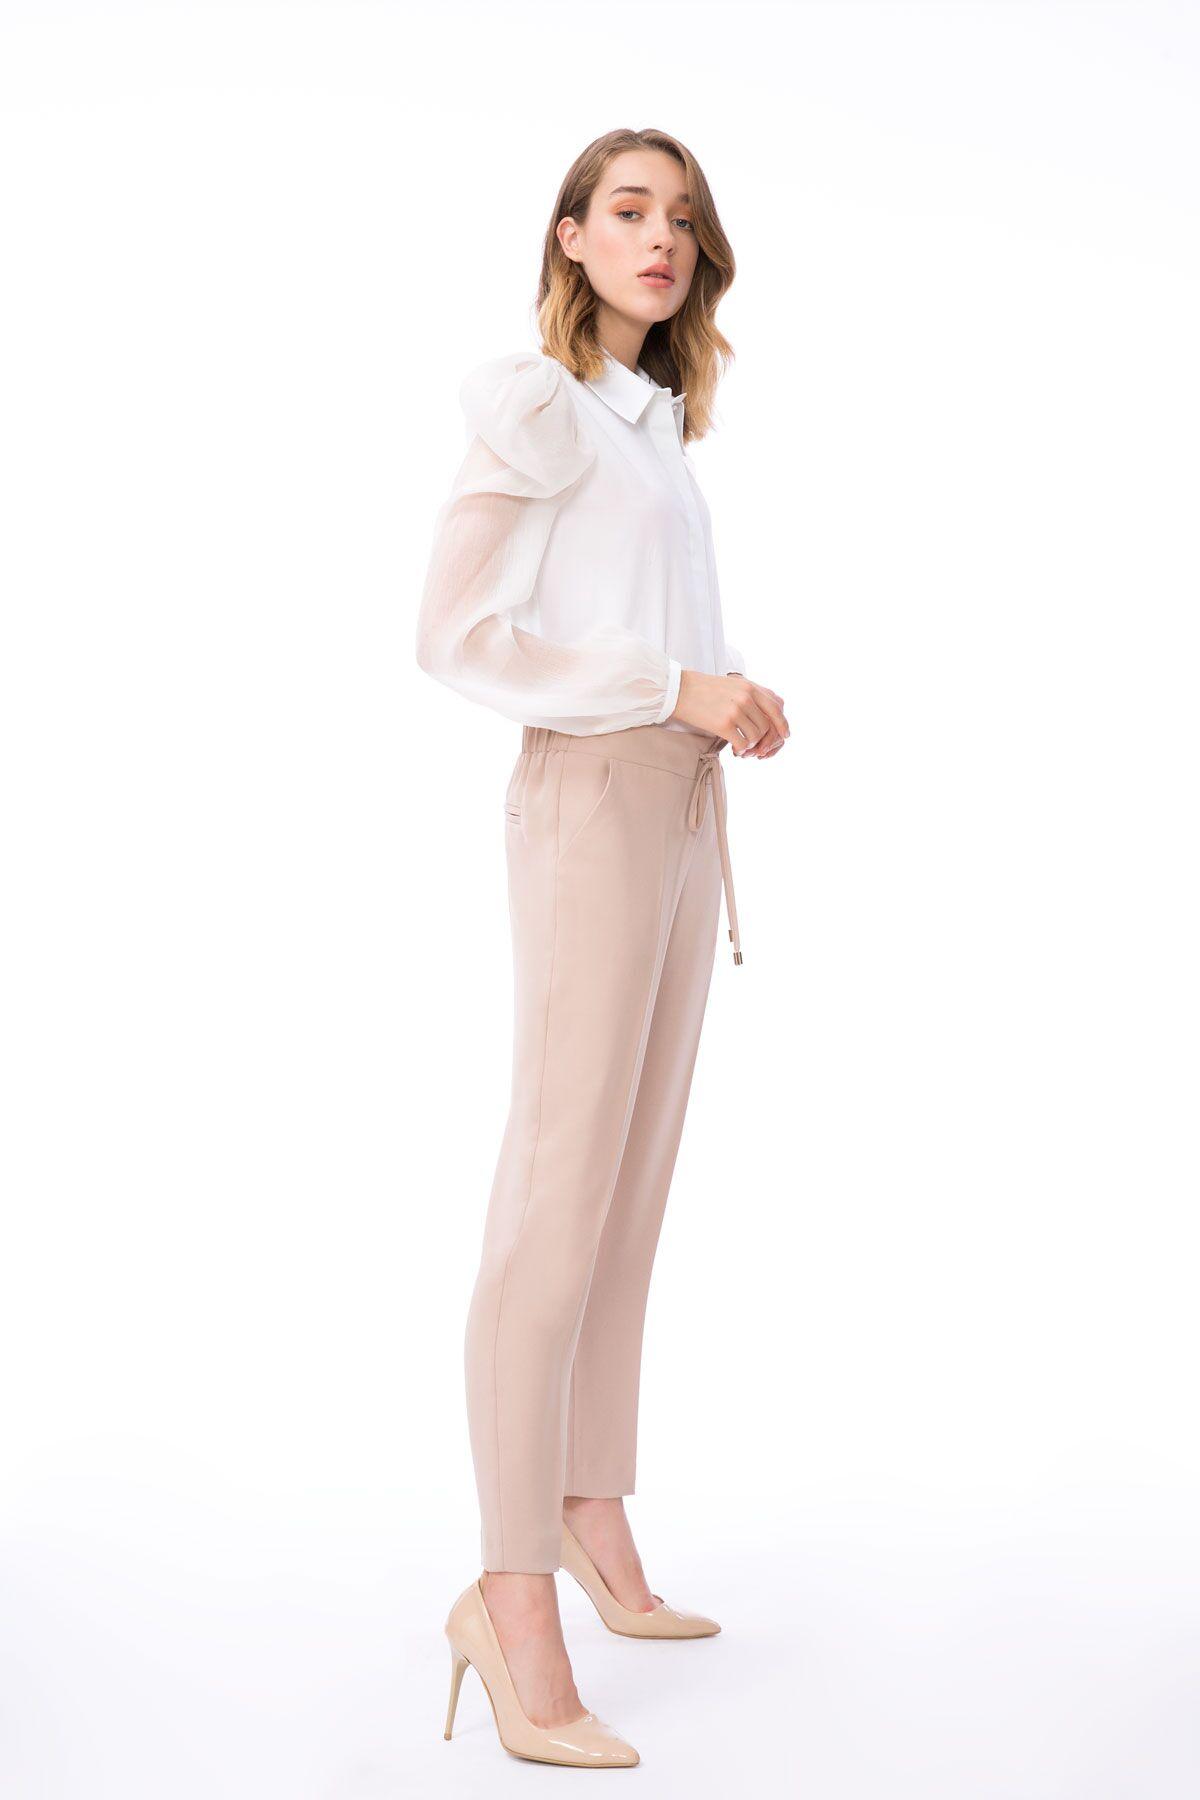 Havuç Kesim Bağcıklı Vizon Renkli Kumaş Pantolon